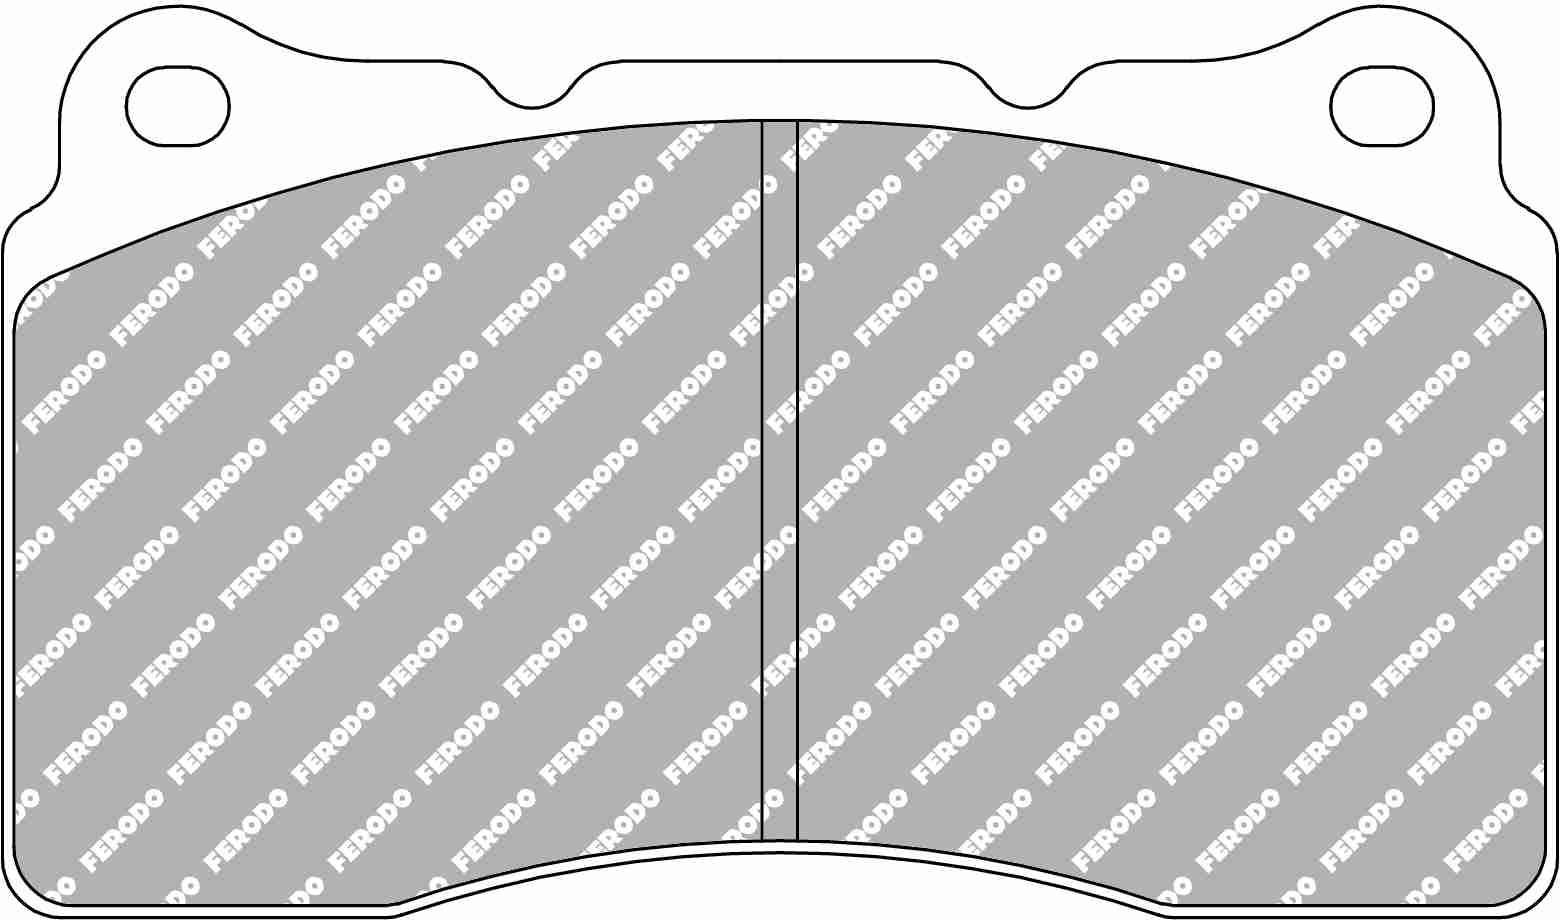 FCP1334R Car Racing - Brake Pads - Fcp1334